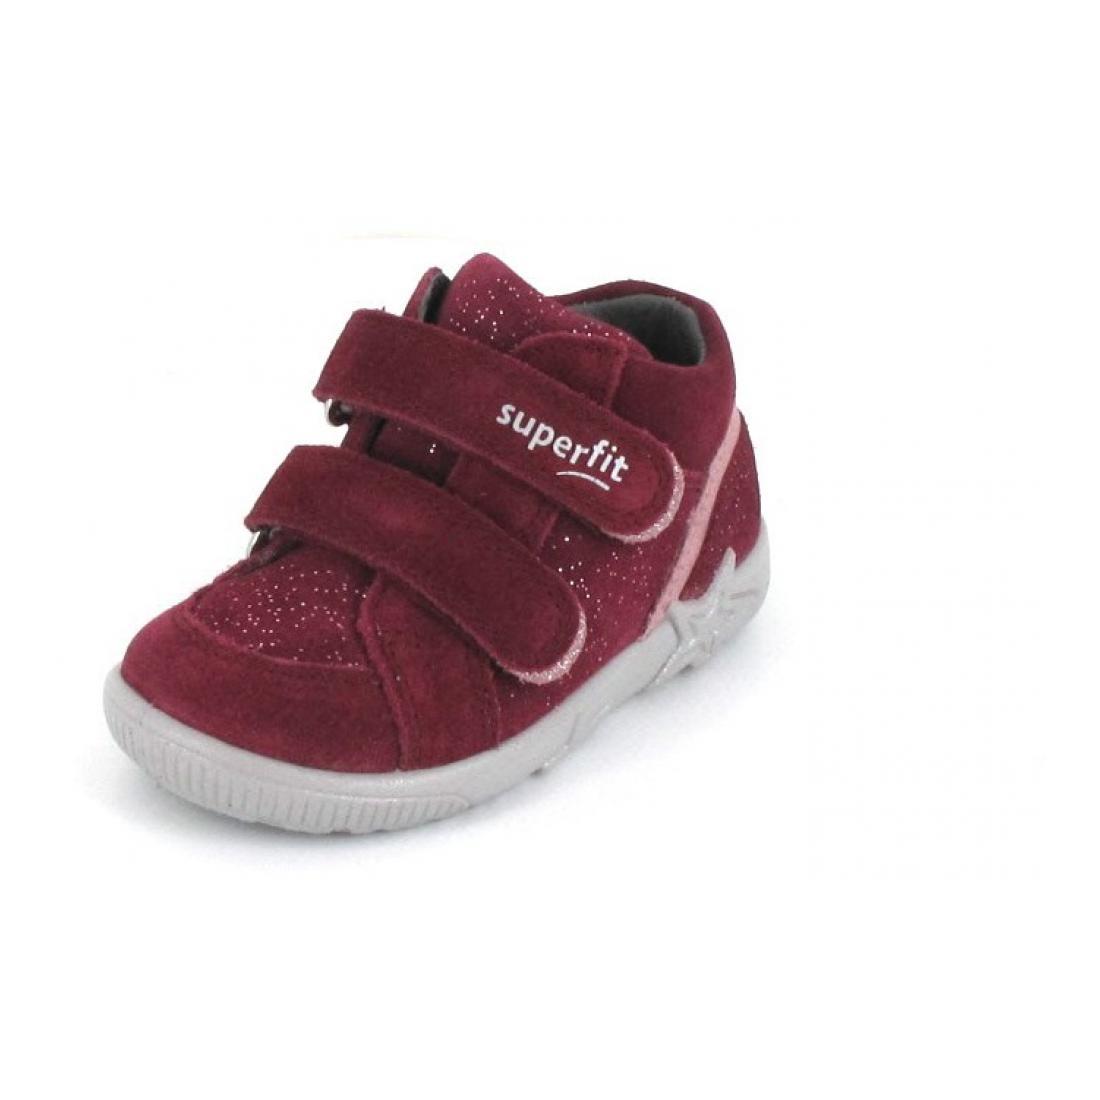 Superfit Sneaker high Starlight